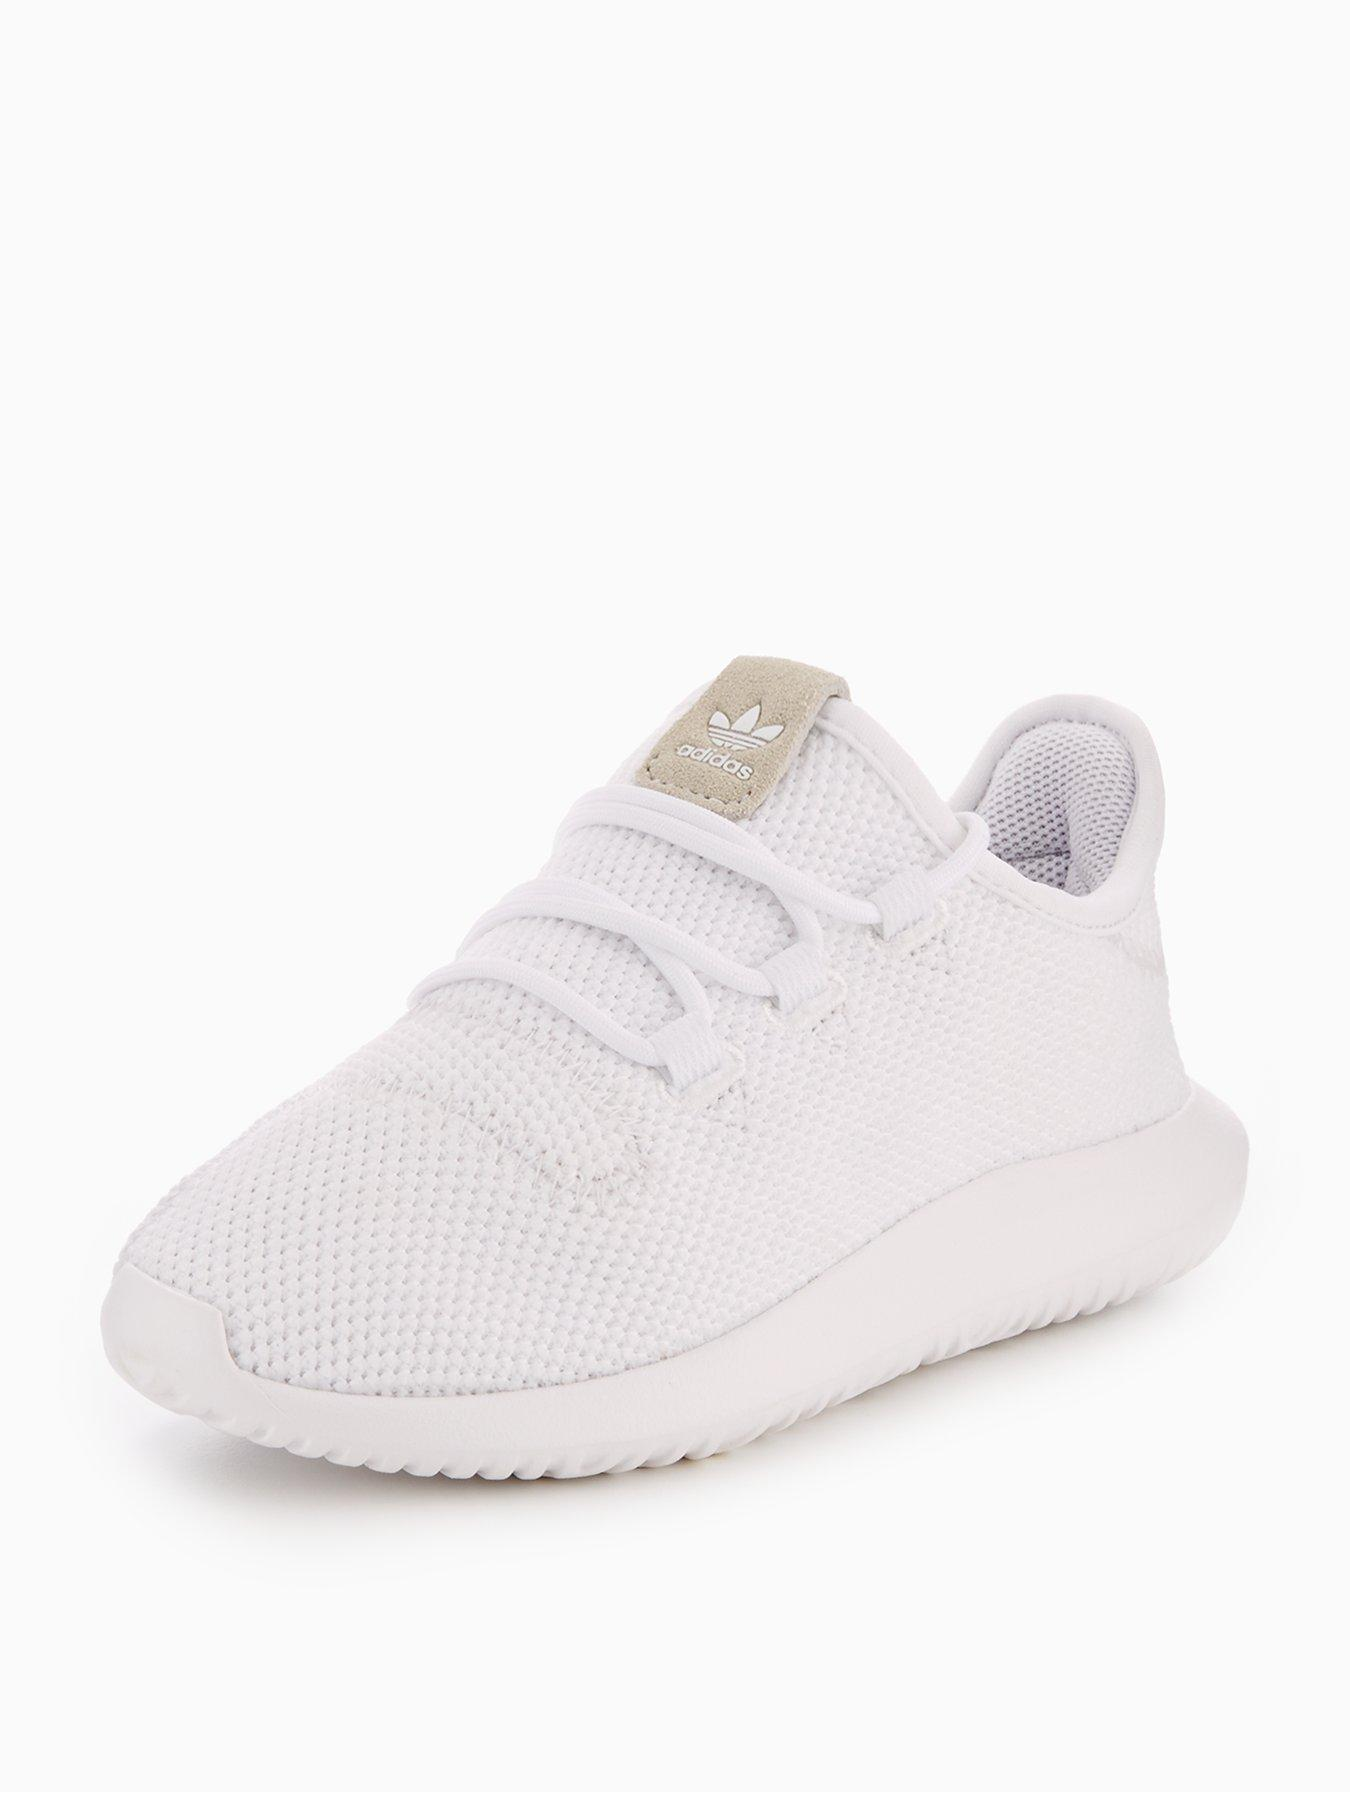 Adidas Originali Per Bambini & Baby Le Scarpe Sportive Adidas